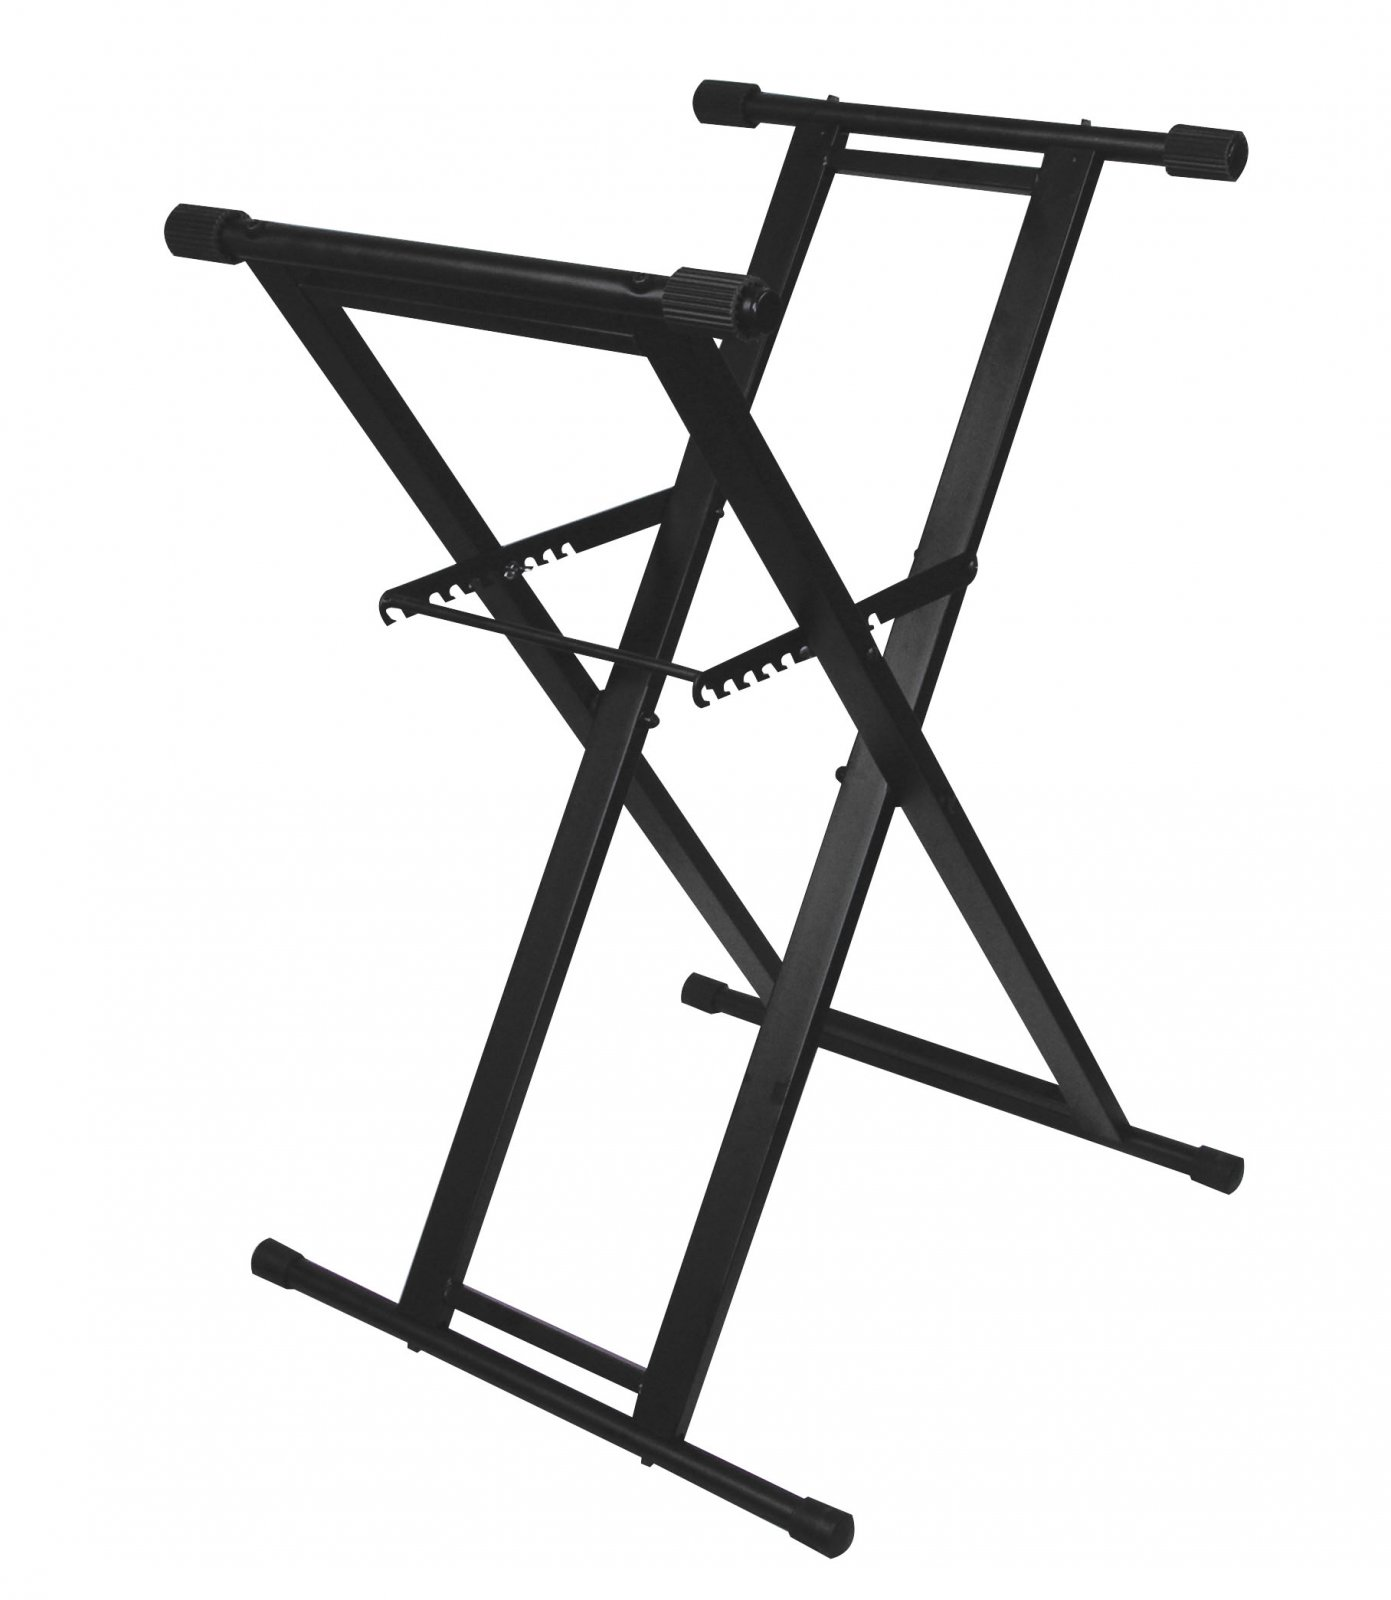 Odyssey Case LTBXS - X Stand, Double Braced - Black